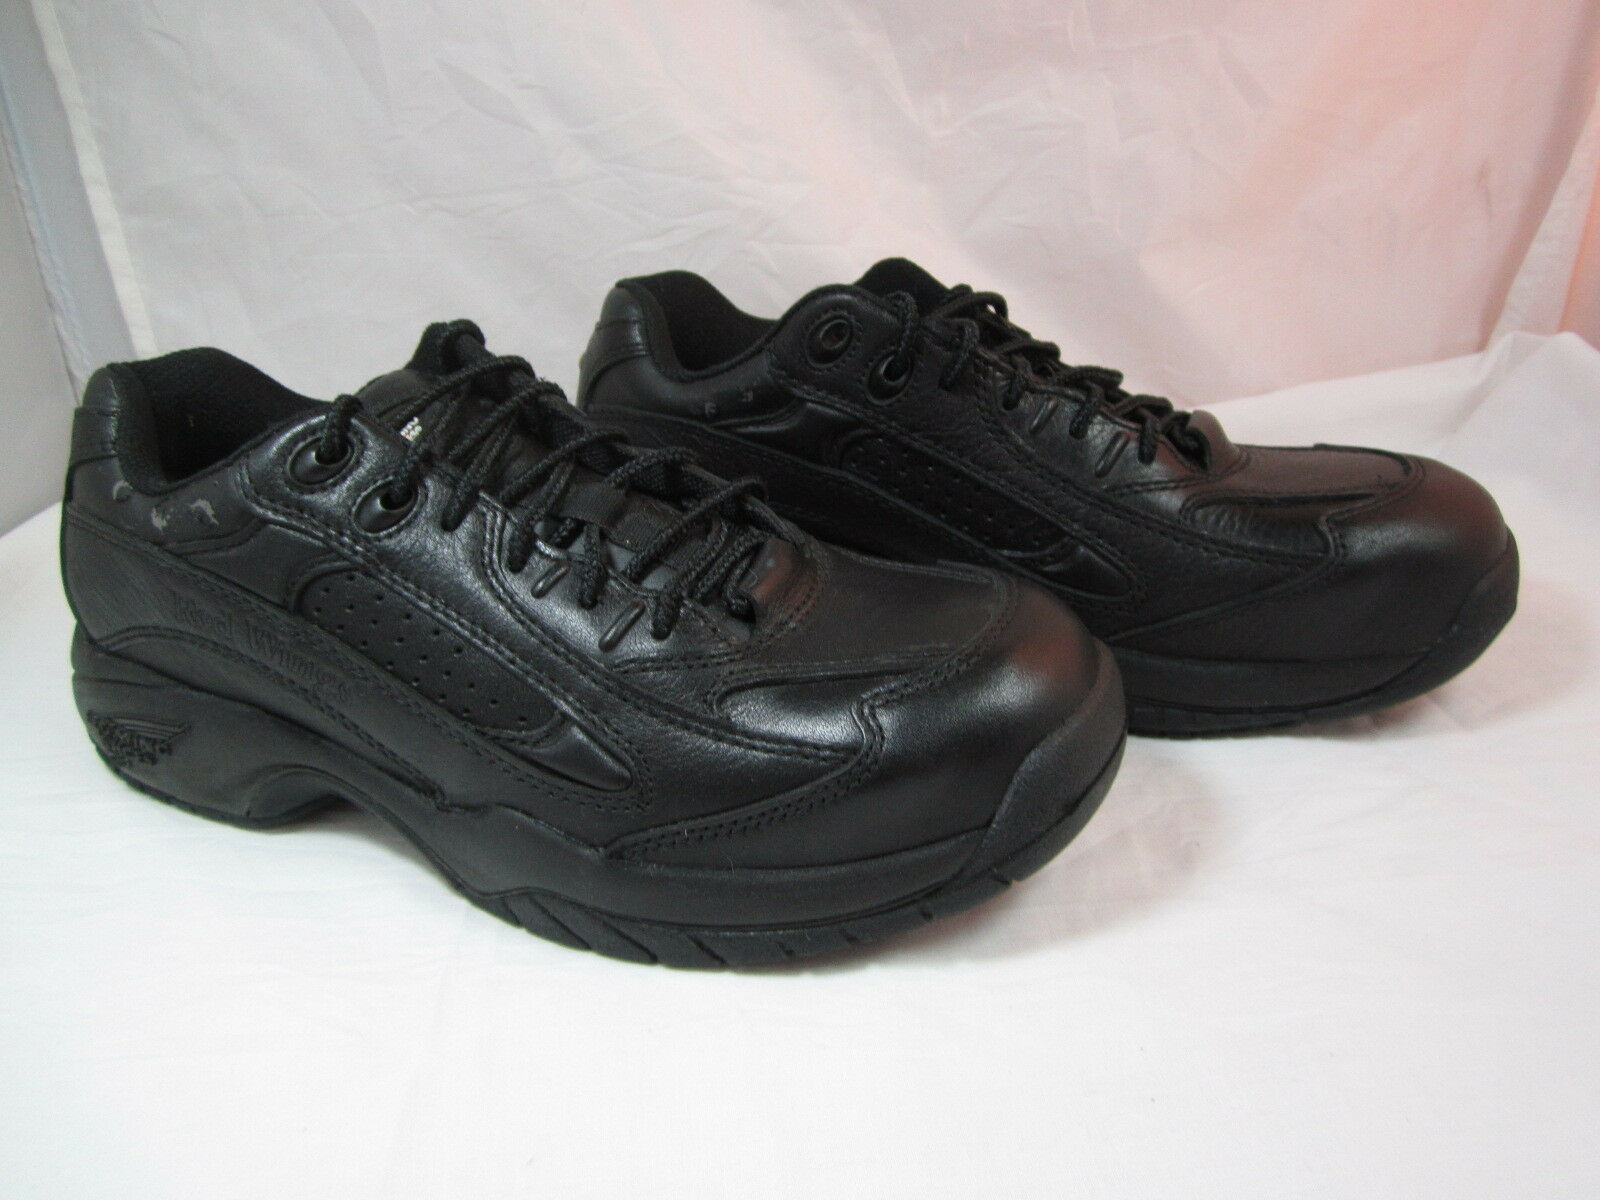 Mens Red Wing Steel Toe, Oil & Slip Resistant Black shoes Size 10B 1.5  Heel